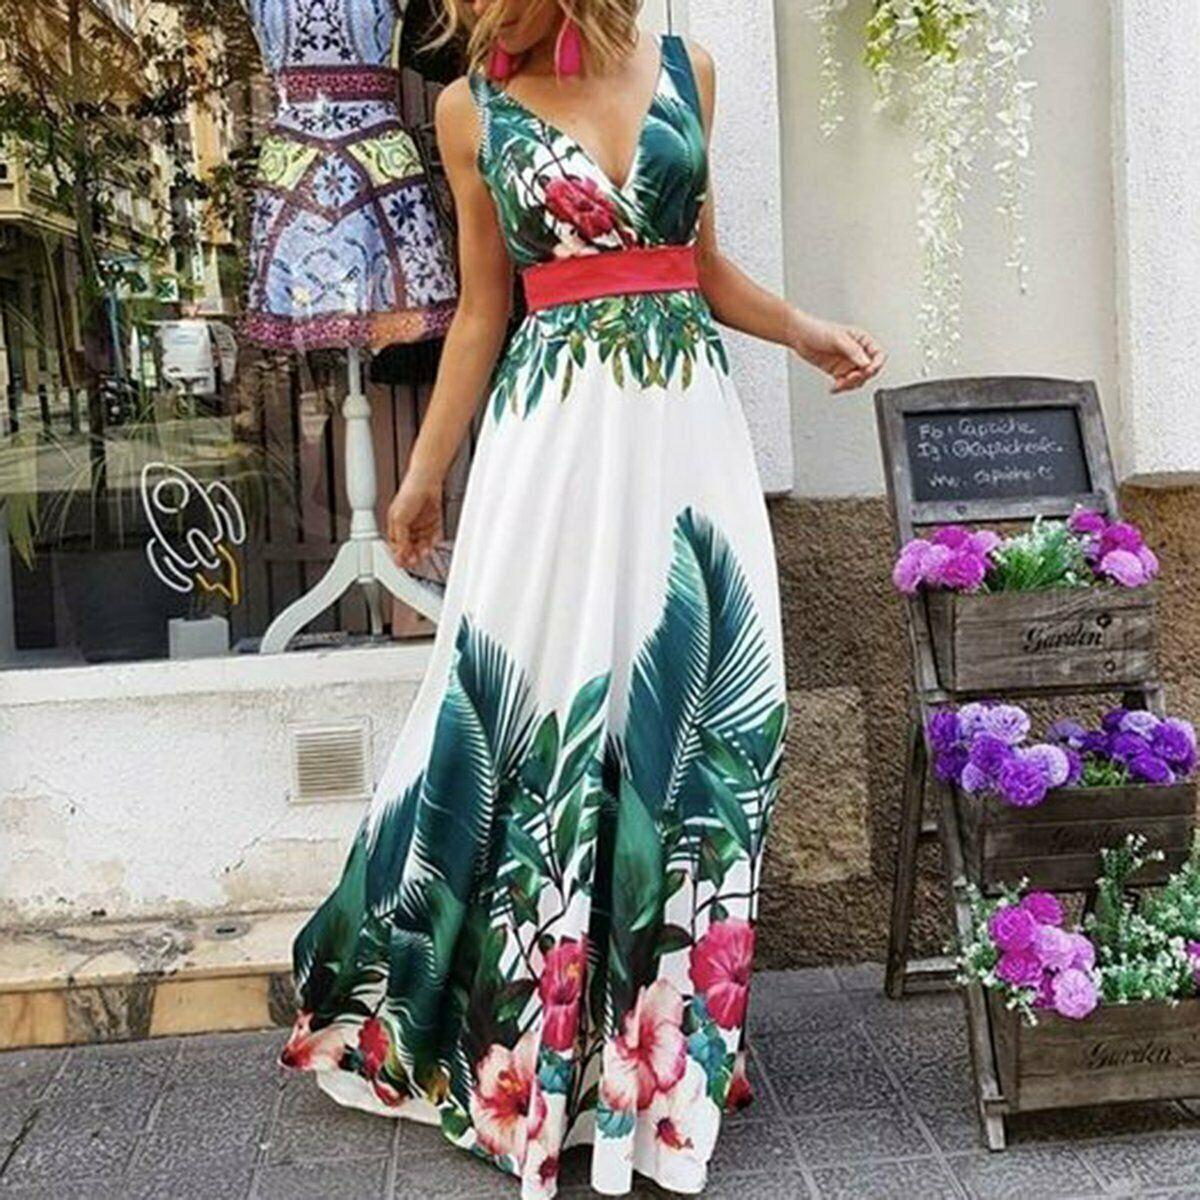 Summer Women Boho Floral Printed Dresses Fashion Ladies Sleeveless Party Evening Long Maxi Dress 2019 Suspenders V-neck Dresses